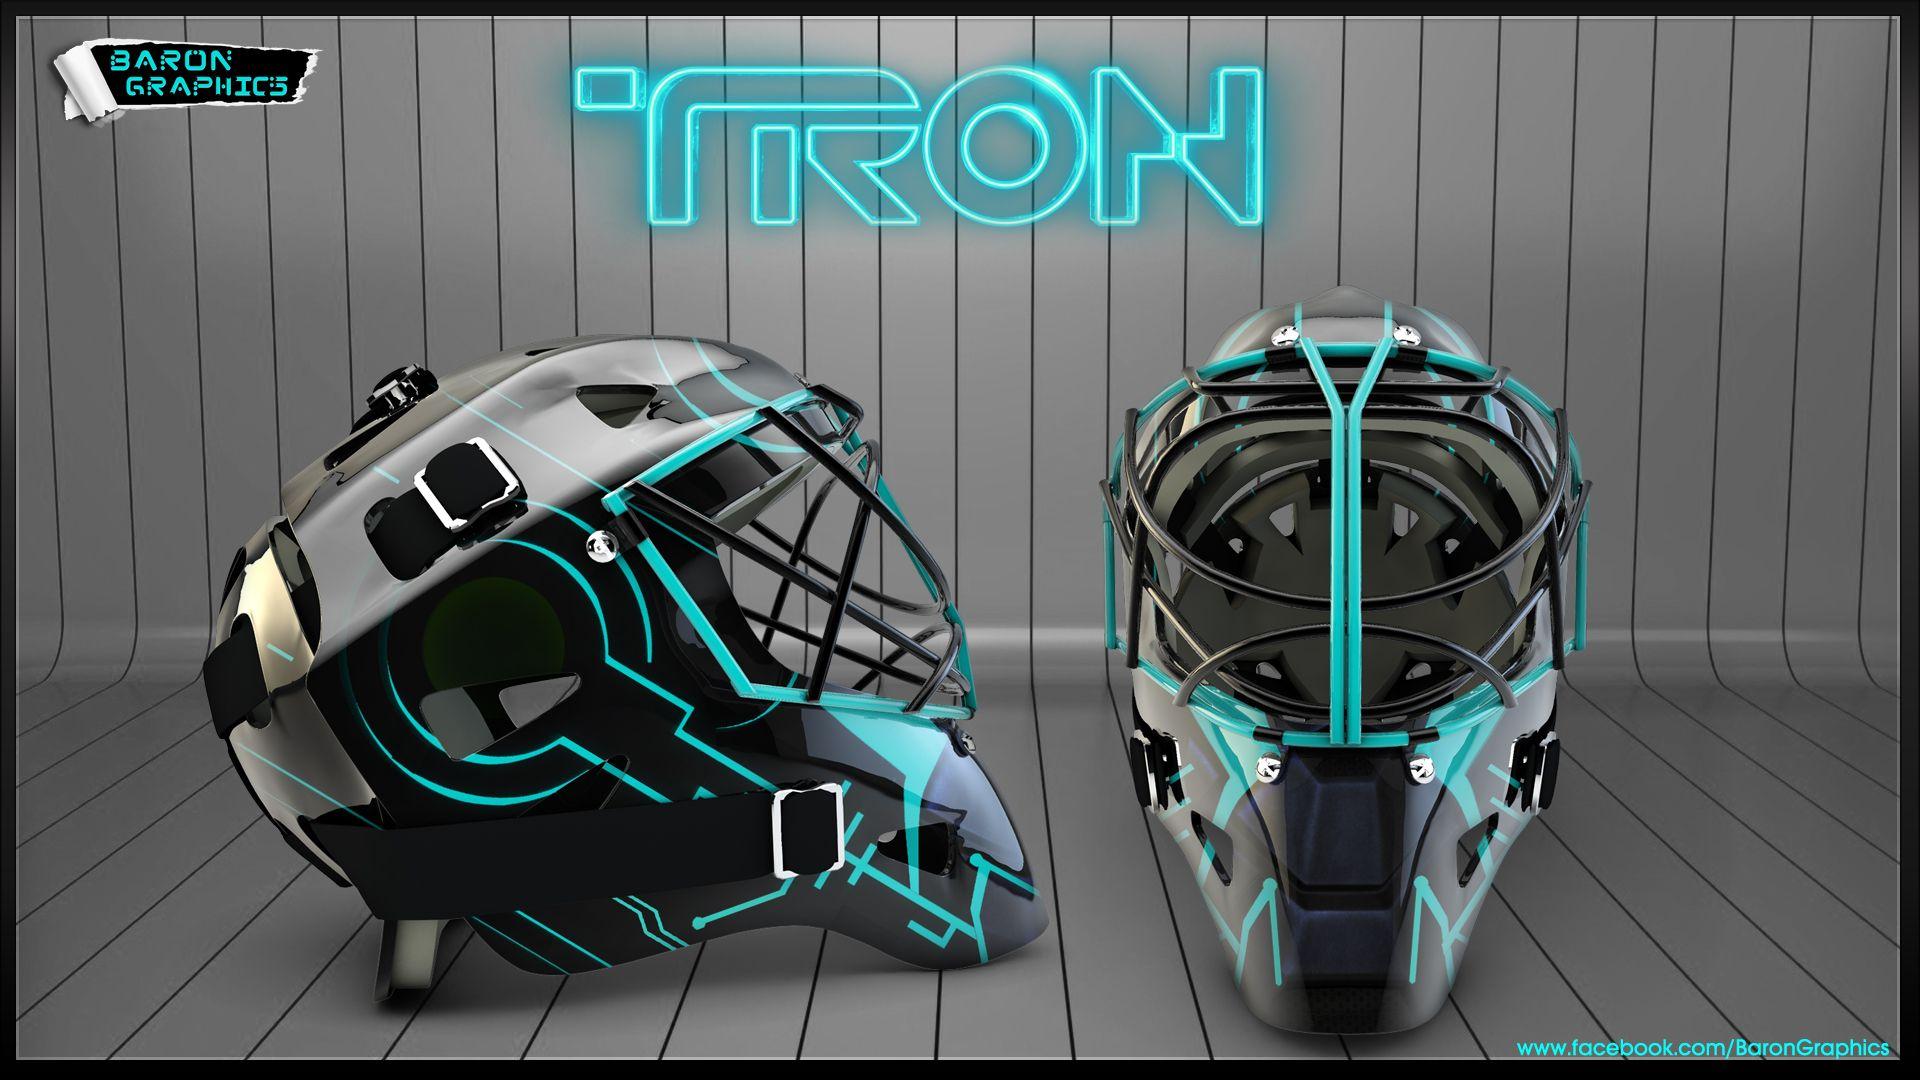 Hockey Helmet Design By Barongraphics Design Pinterest Ice